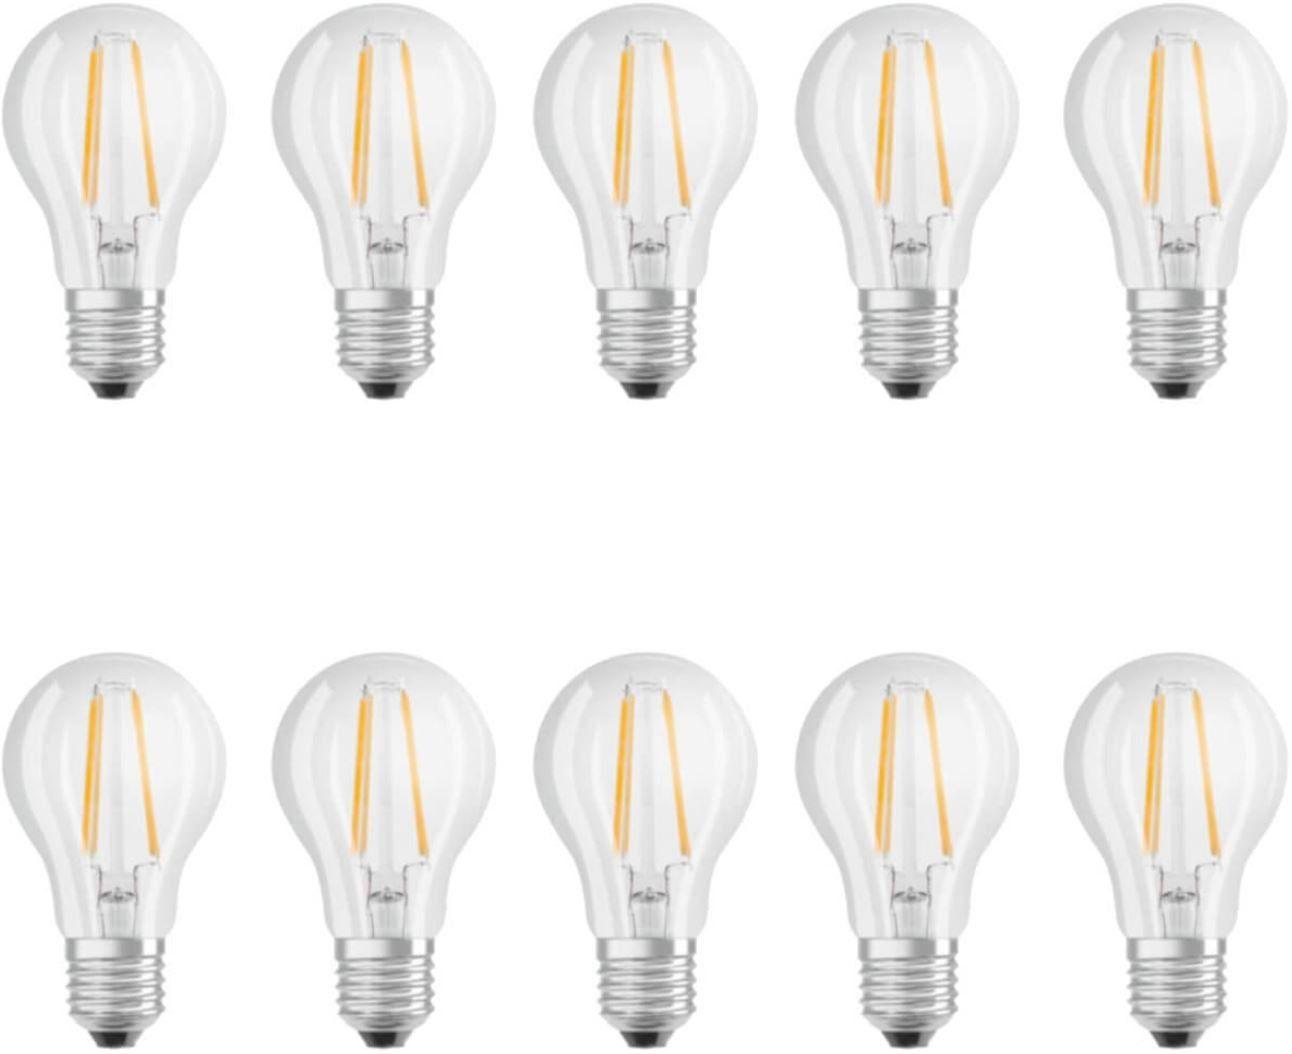 osram filament led e 27 birnen 7w im 10er pack f r 25 95 statt 33. Black Bedroom Furniture Sets. Home Design Ideas